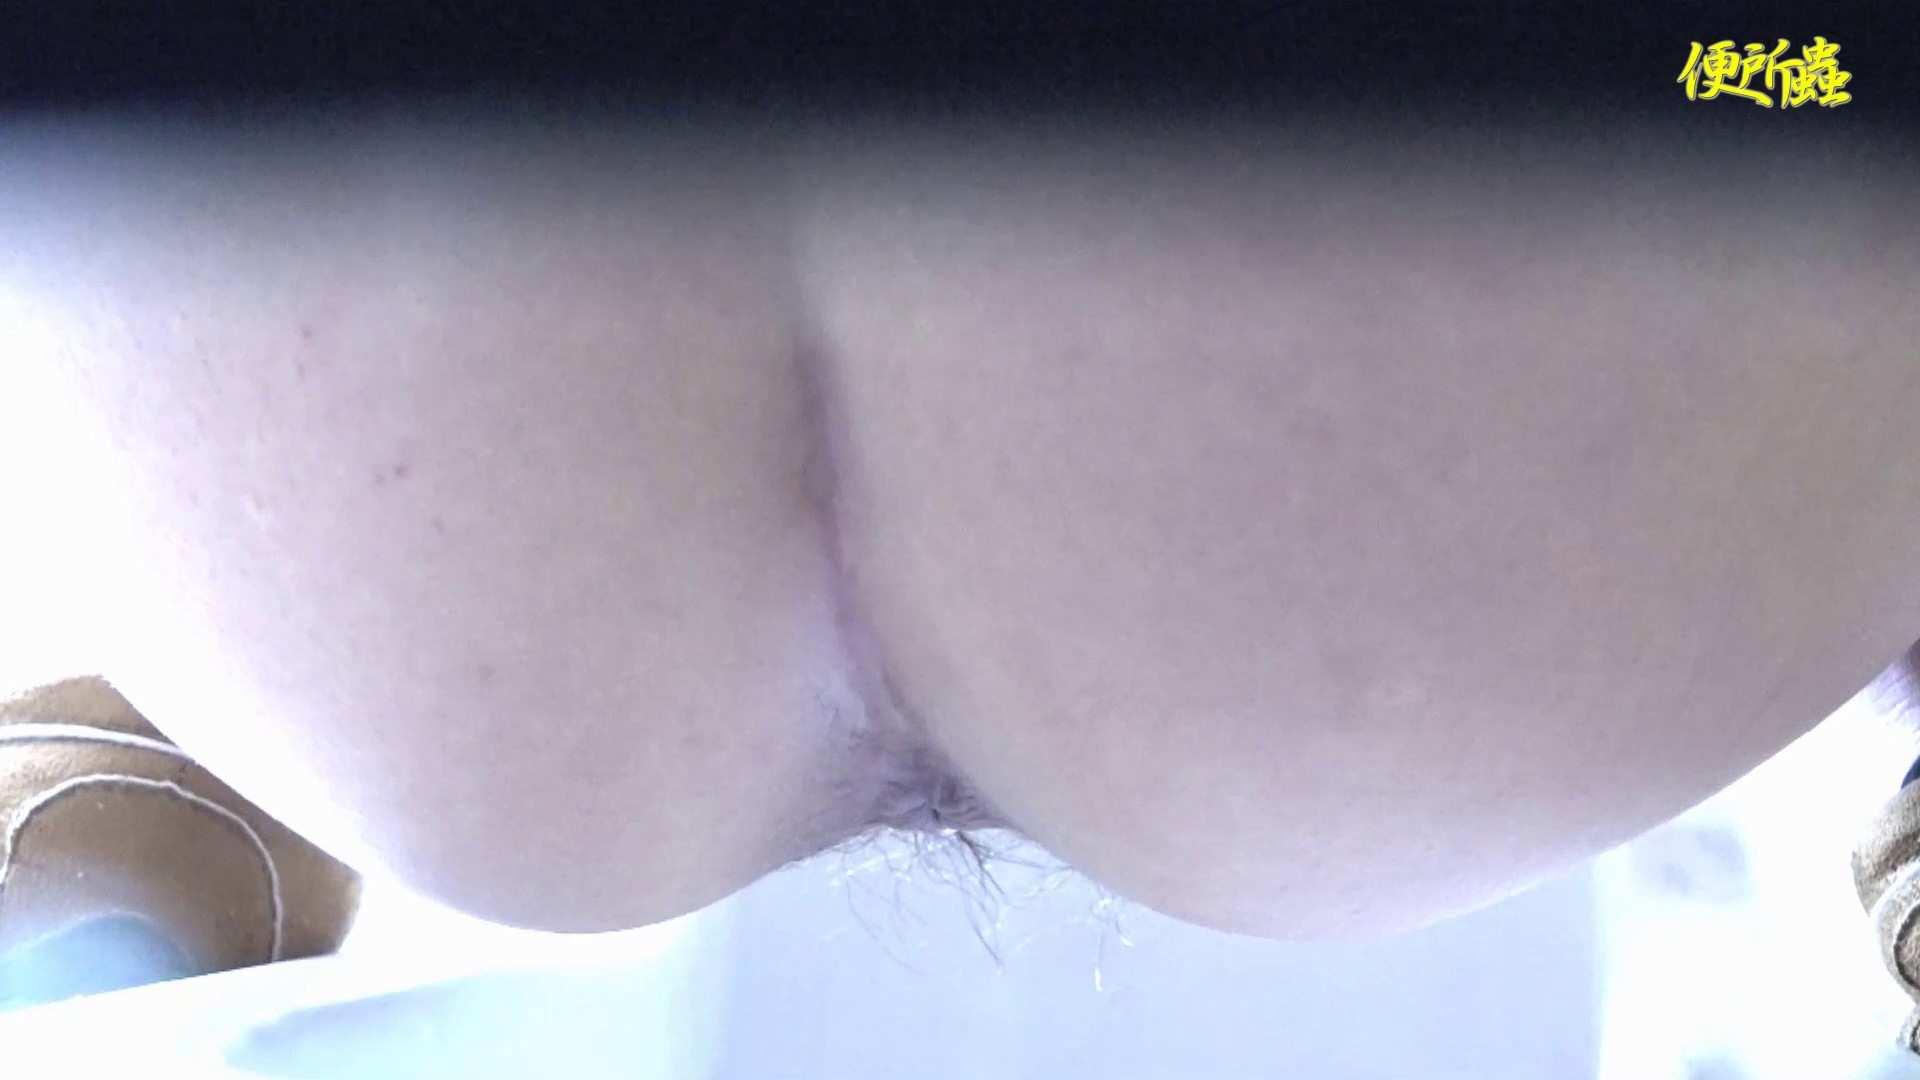 vol.01 便所蟲さんのリターン~便所蟲2匹目~ ギャルズ 濡れ場動画紹介 79画像 42